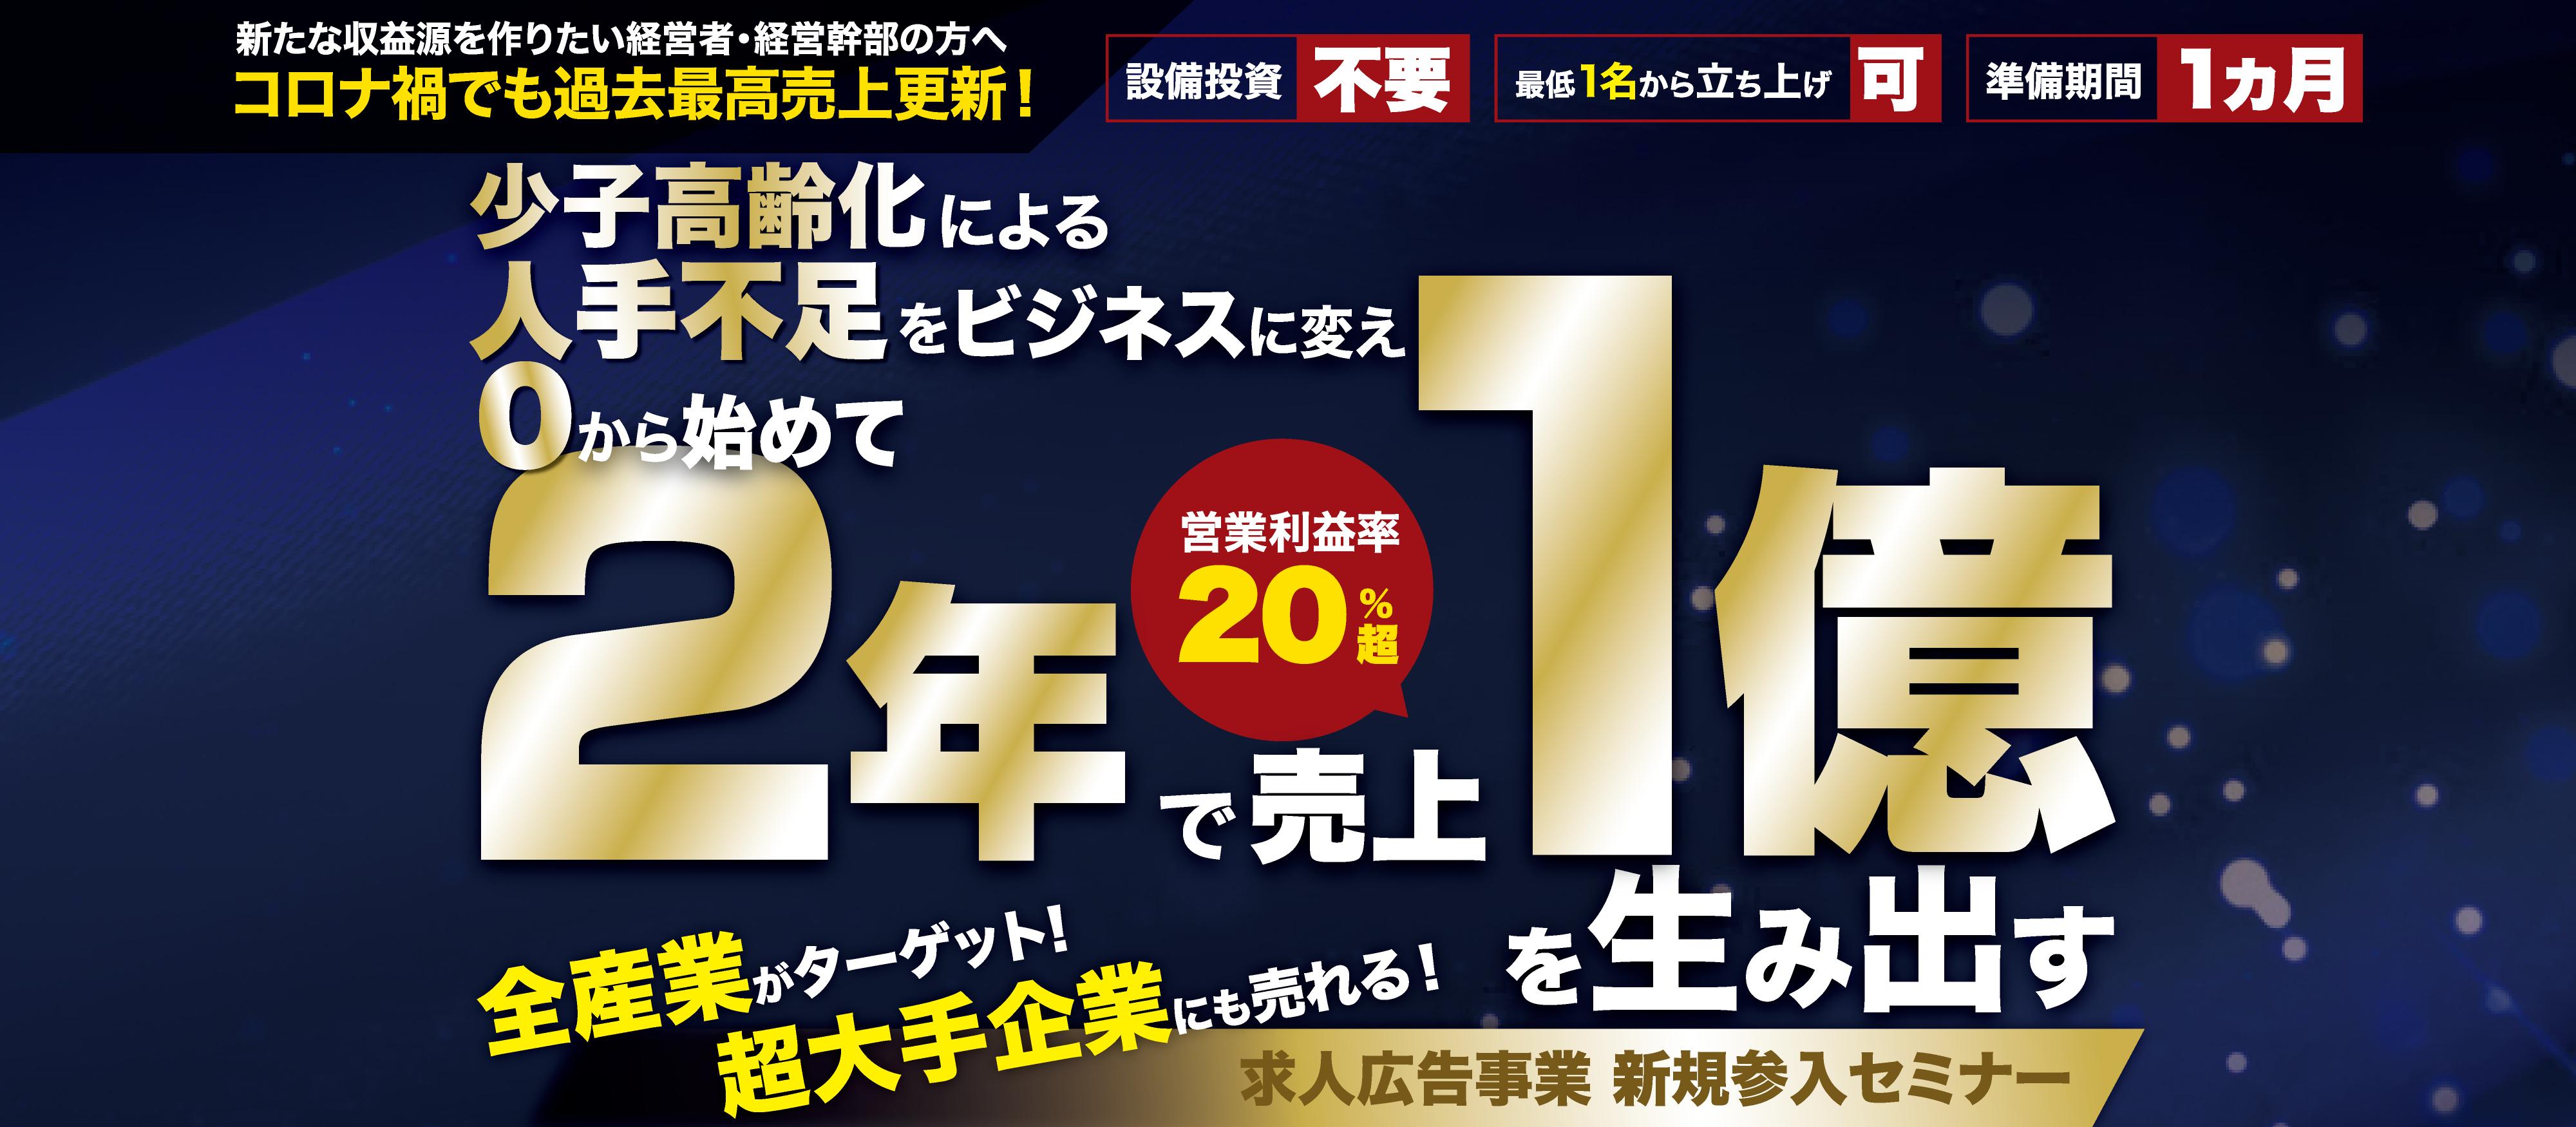 【webセミナー】求人プラットフォーム新規立上げセミナー